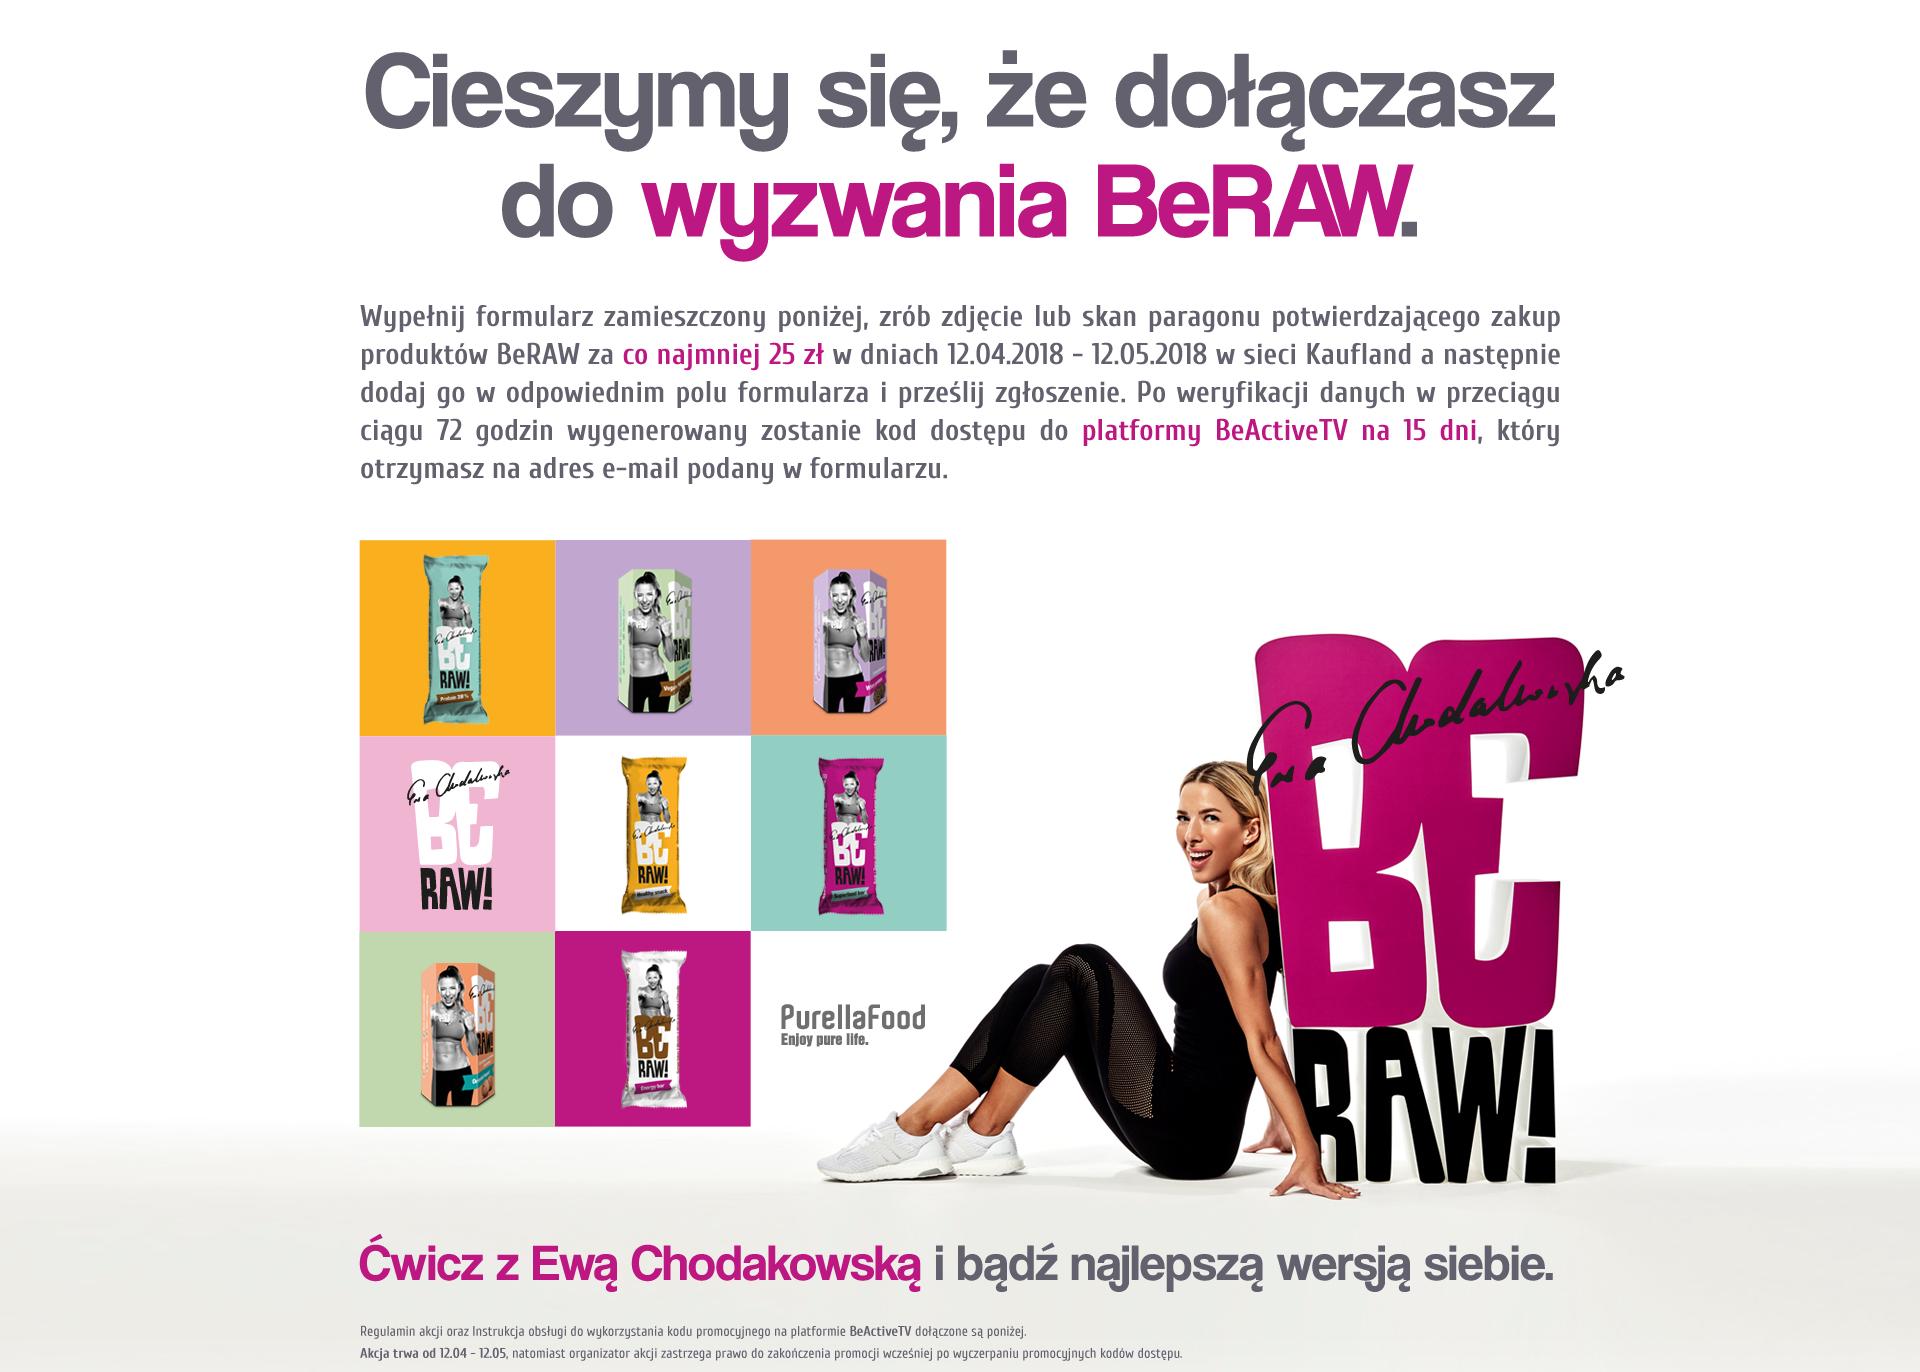 Dostęp do BeActiveTV (Ewa Chodakowska)